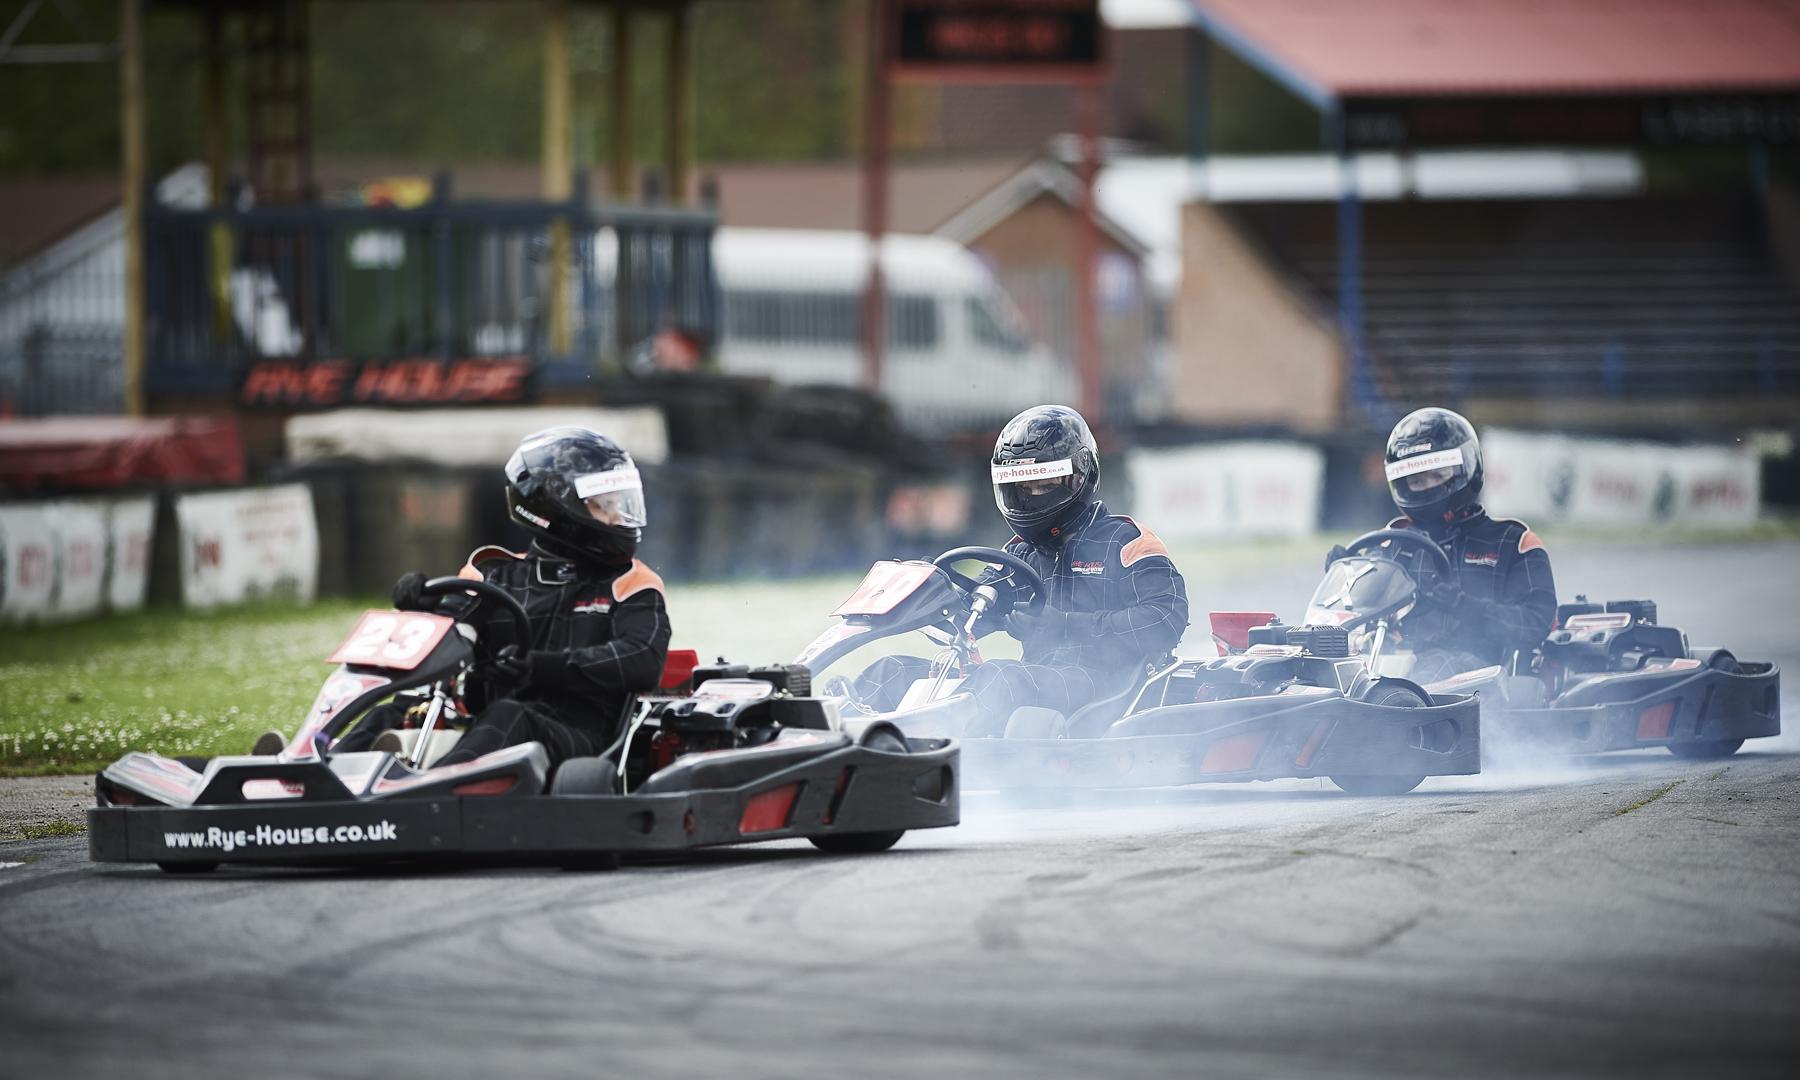 go karting championships